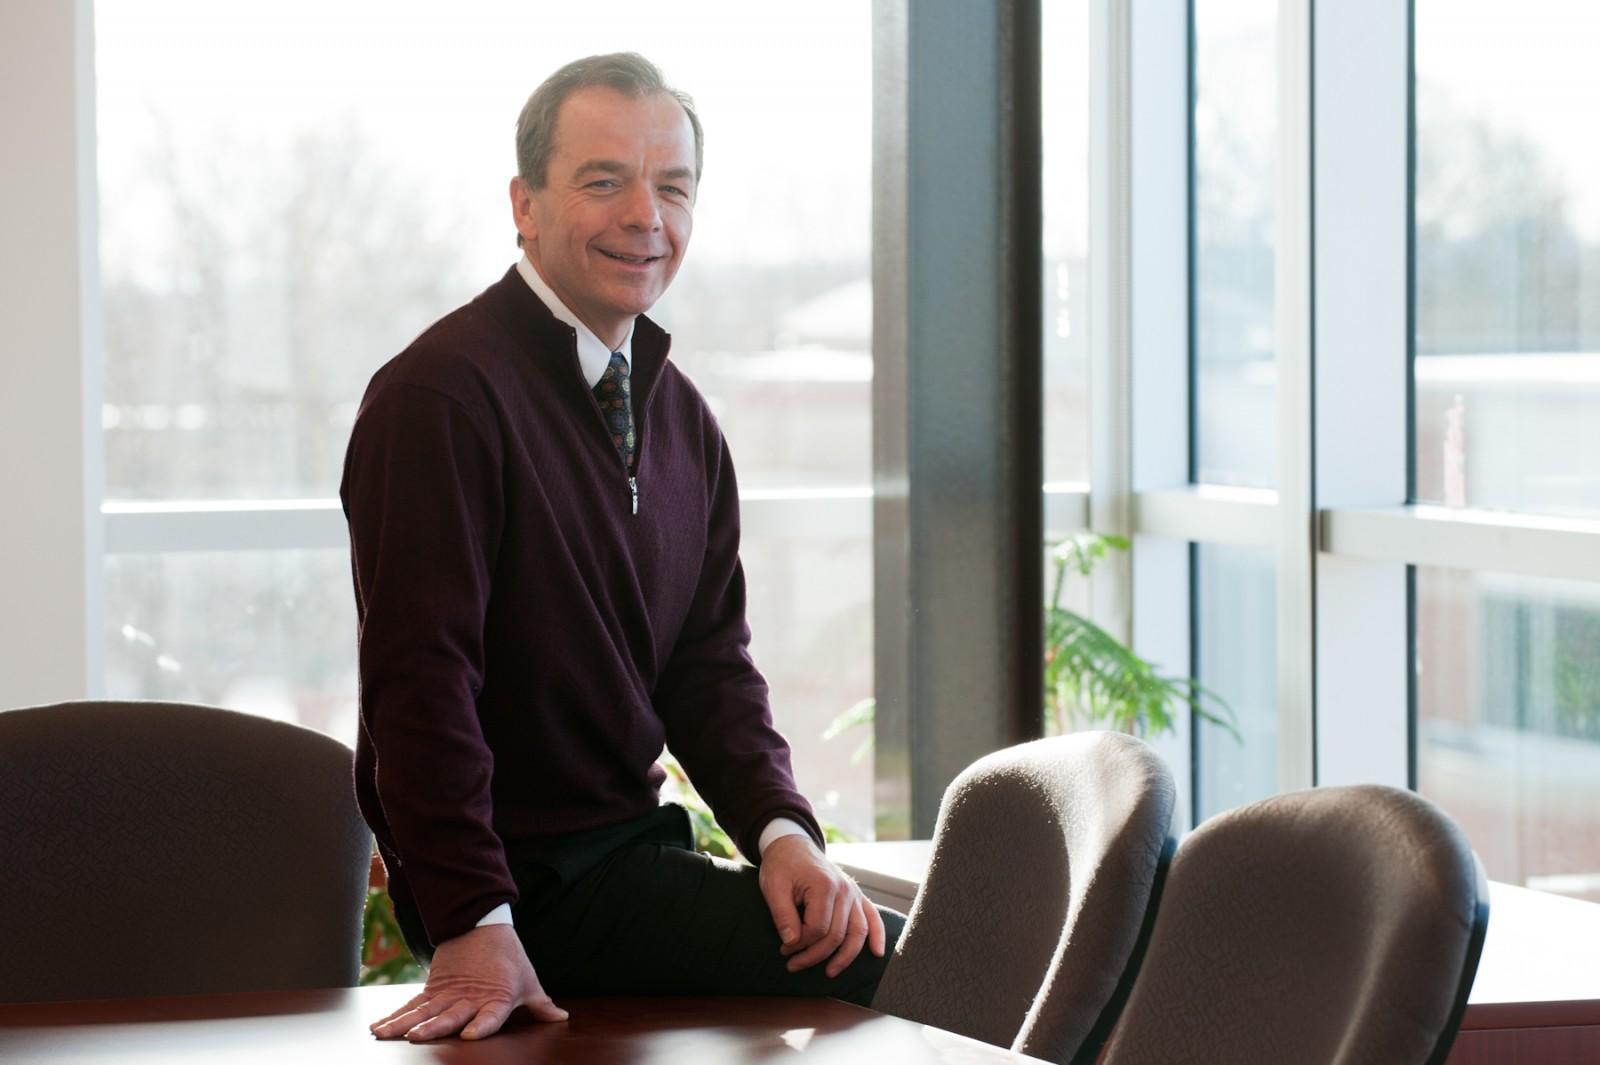 William J. Montelpare, PhD. Photo courtesy of University of Prince Edward Island.